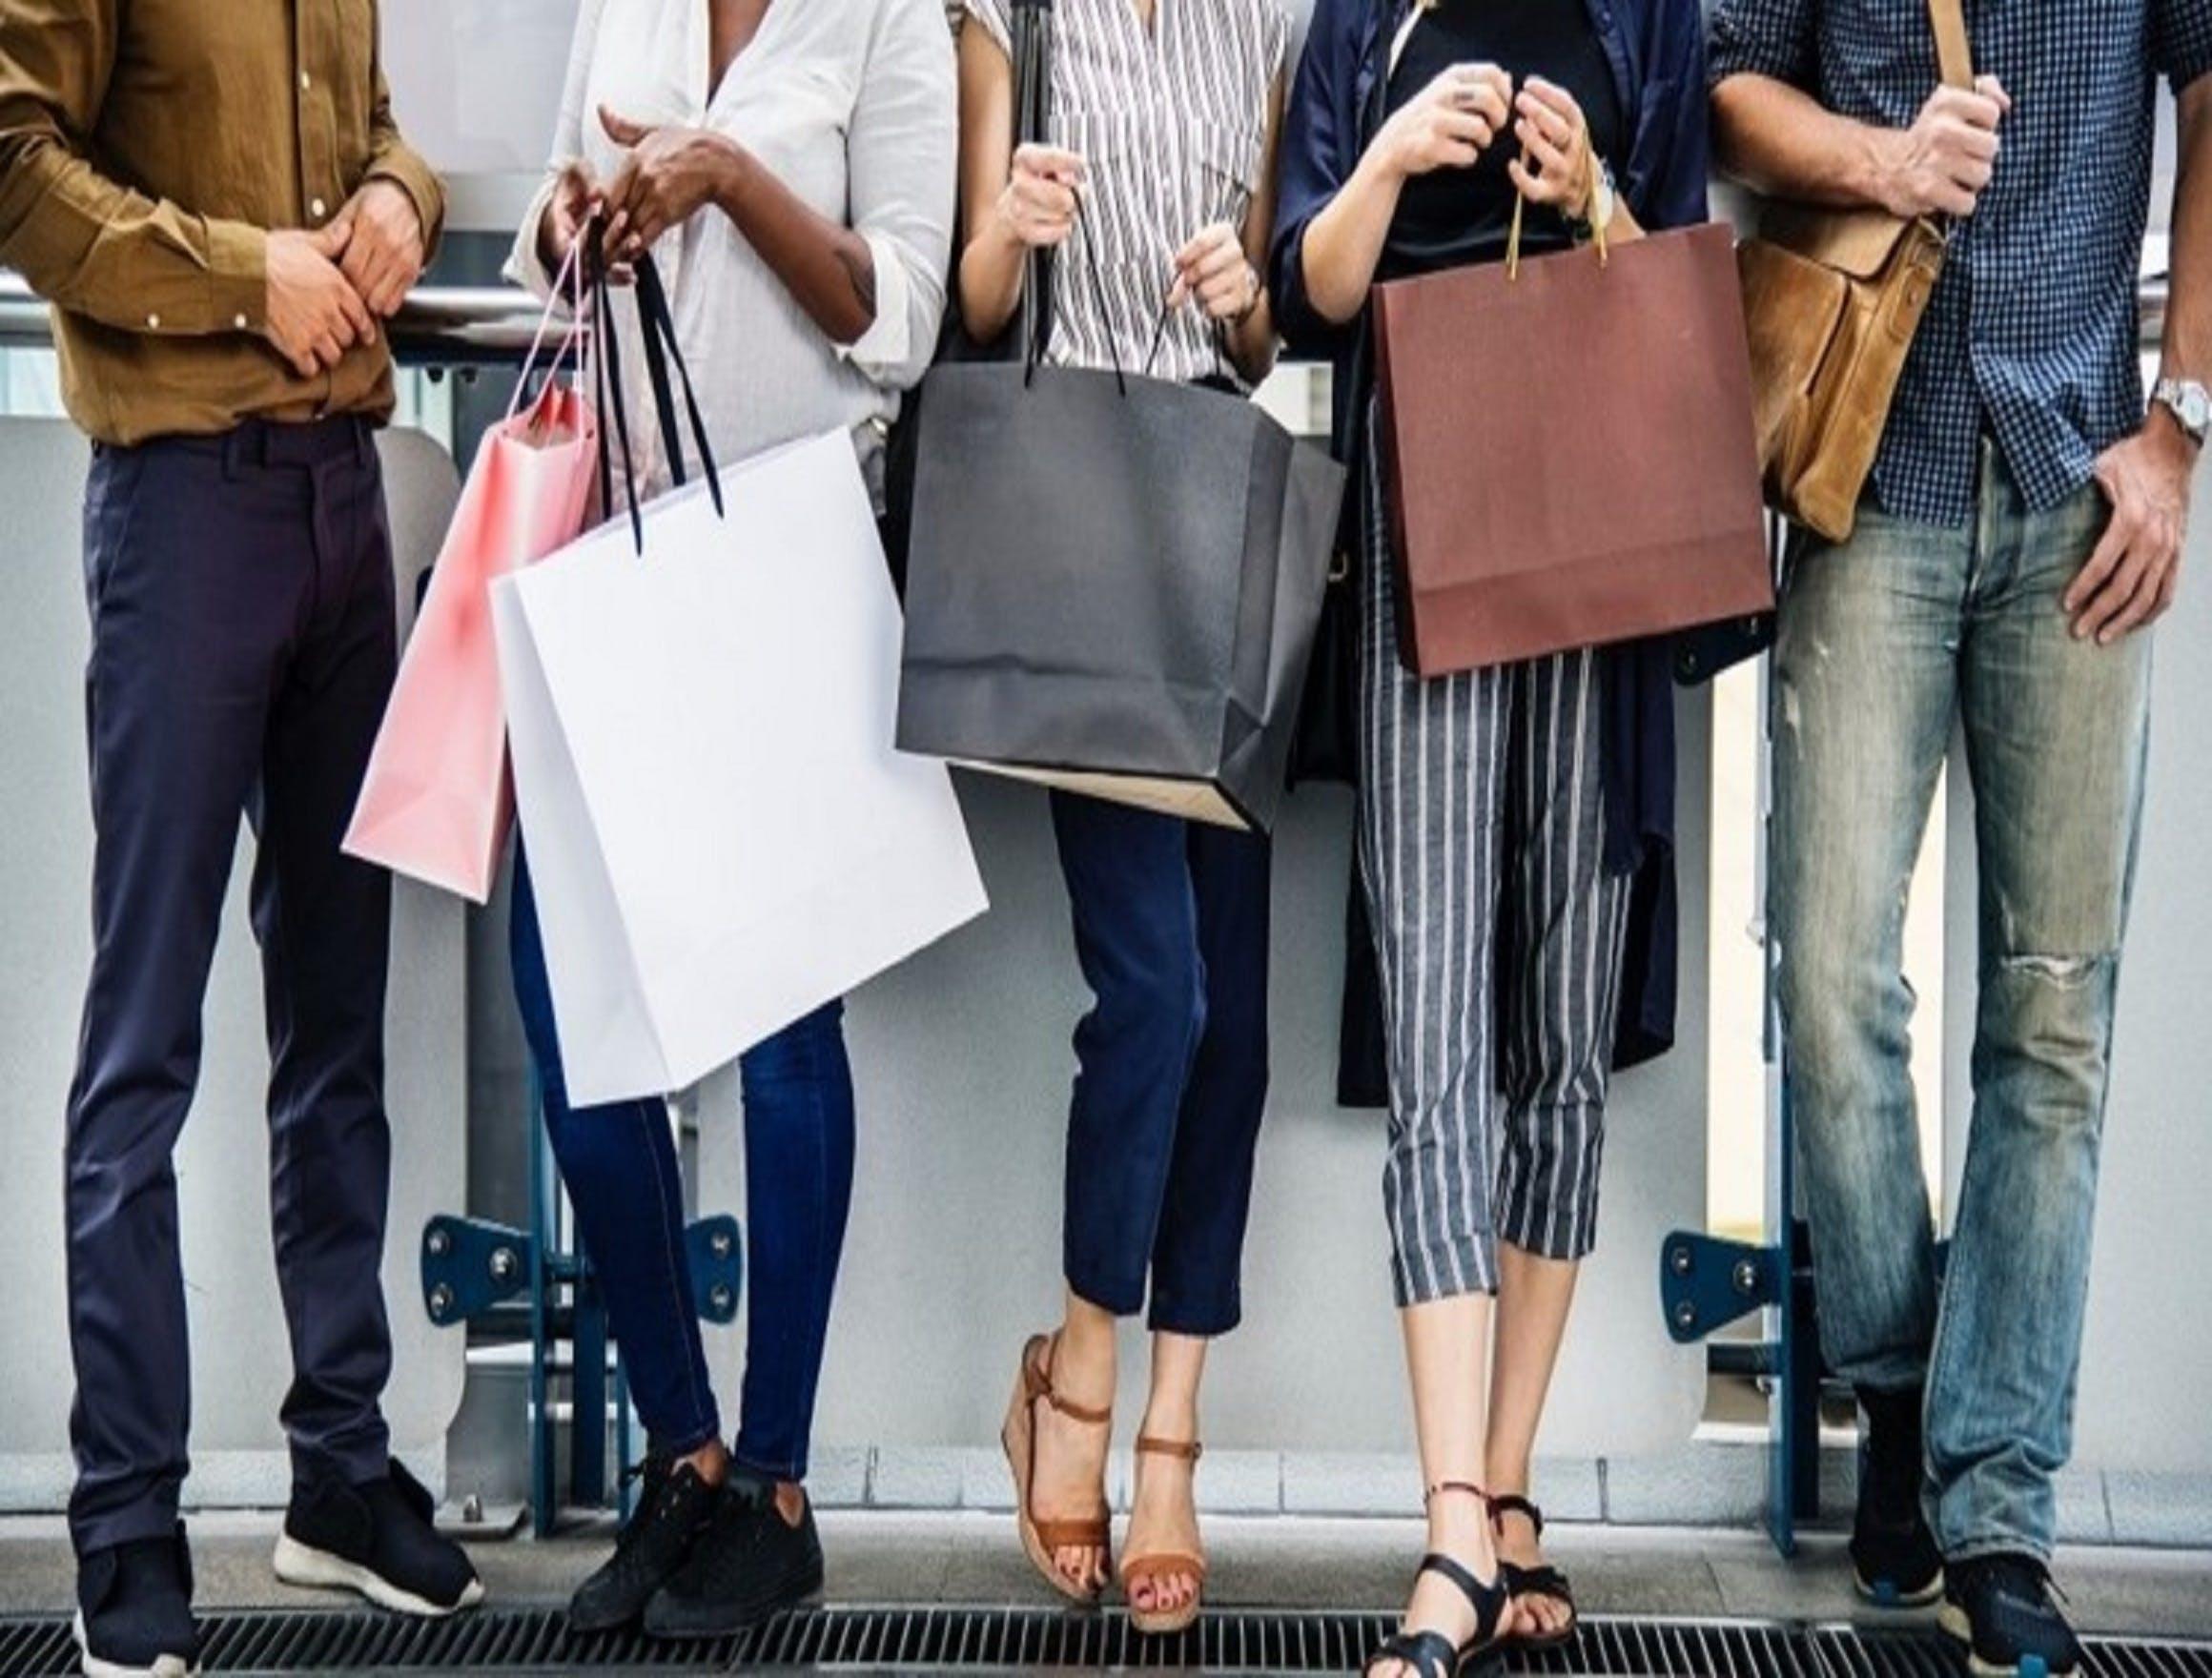 Gen X – don't overlook the 'forgotten generation' of shoppers